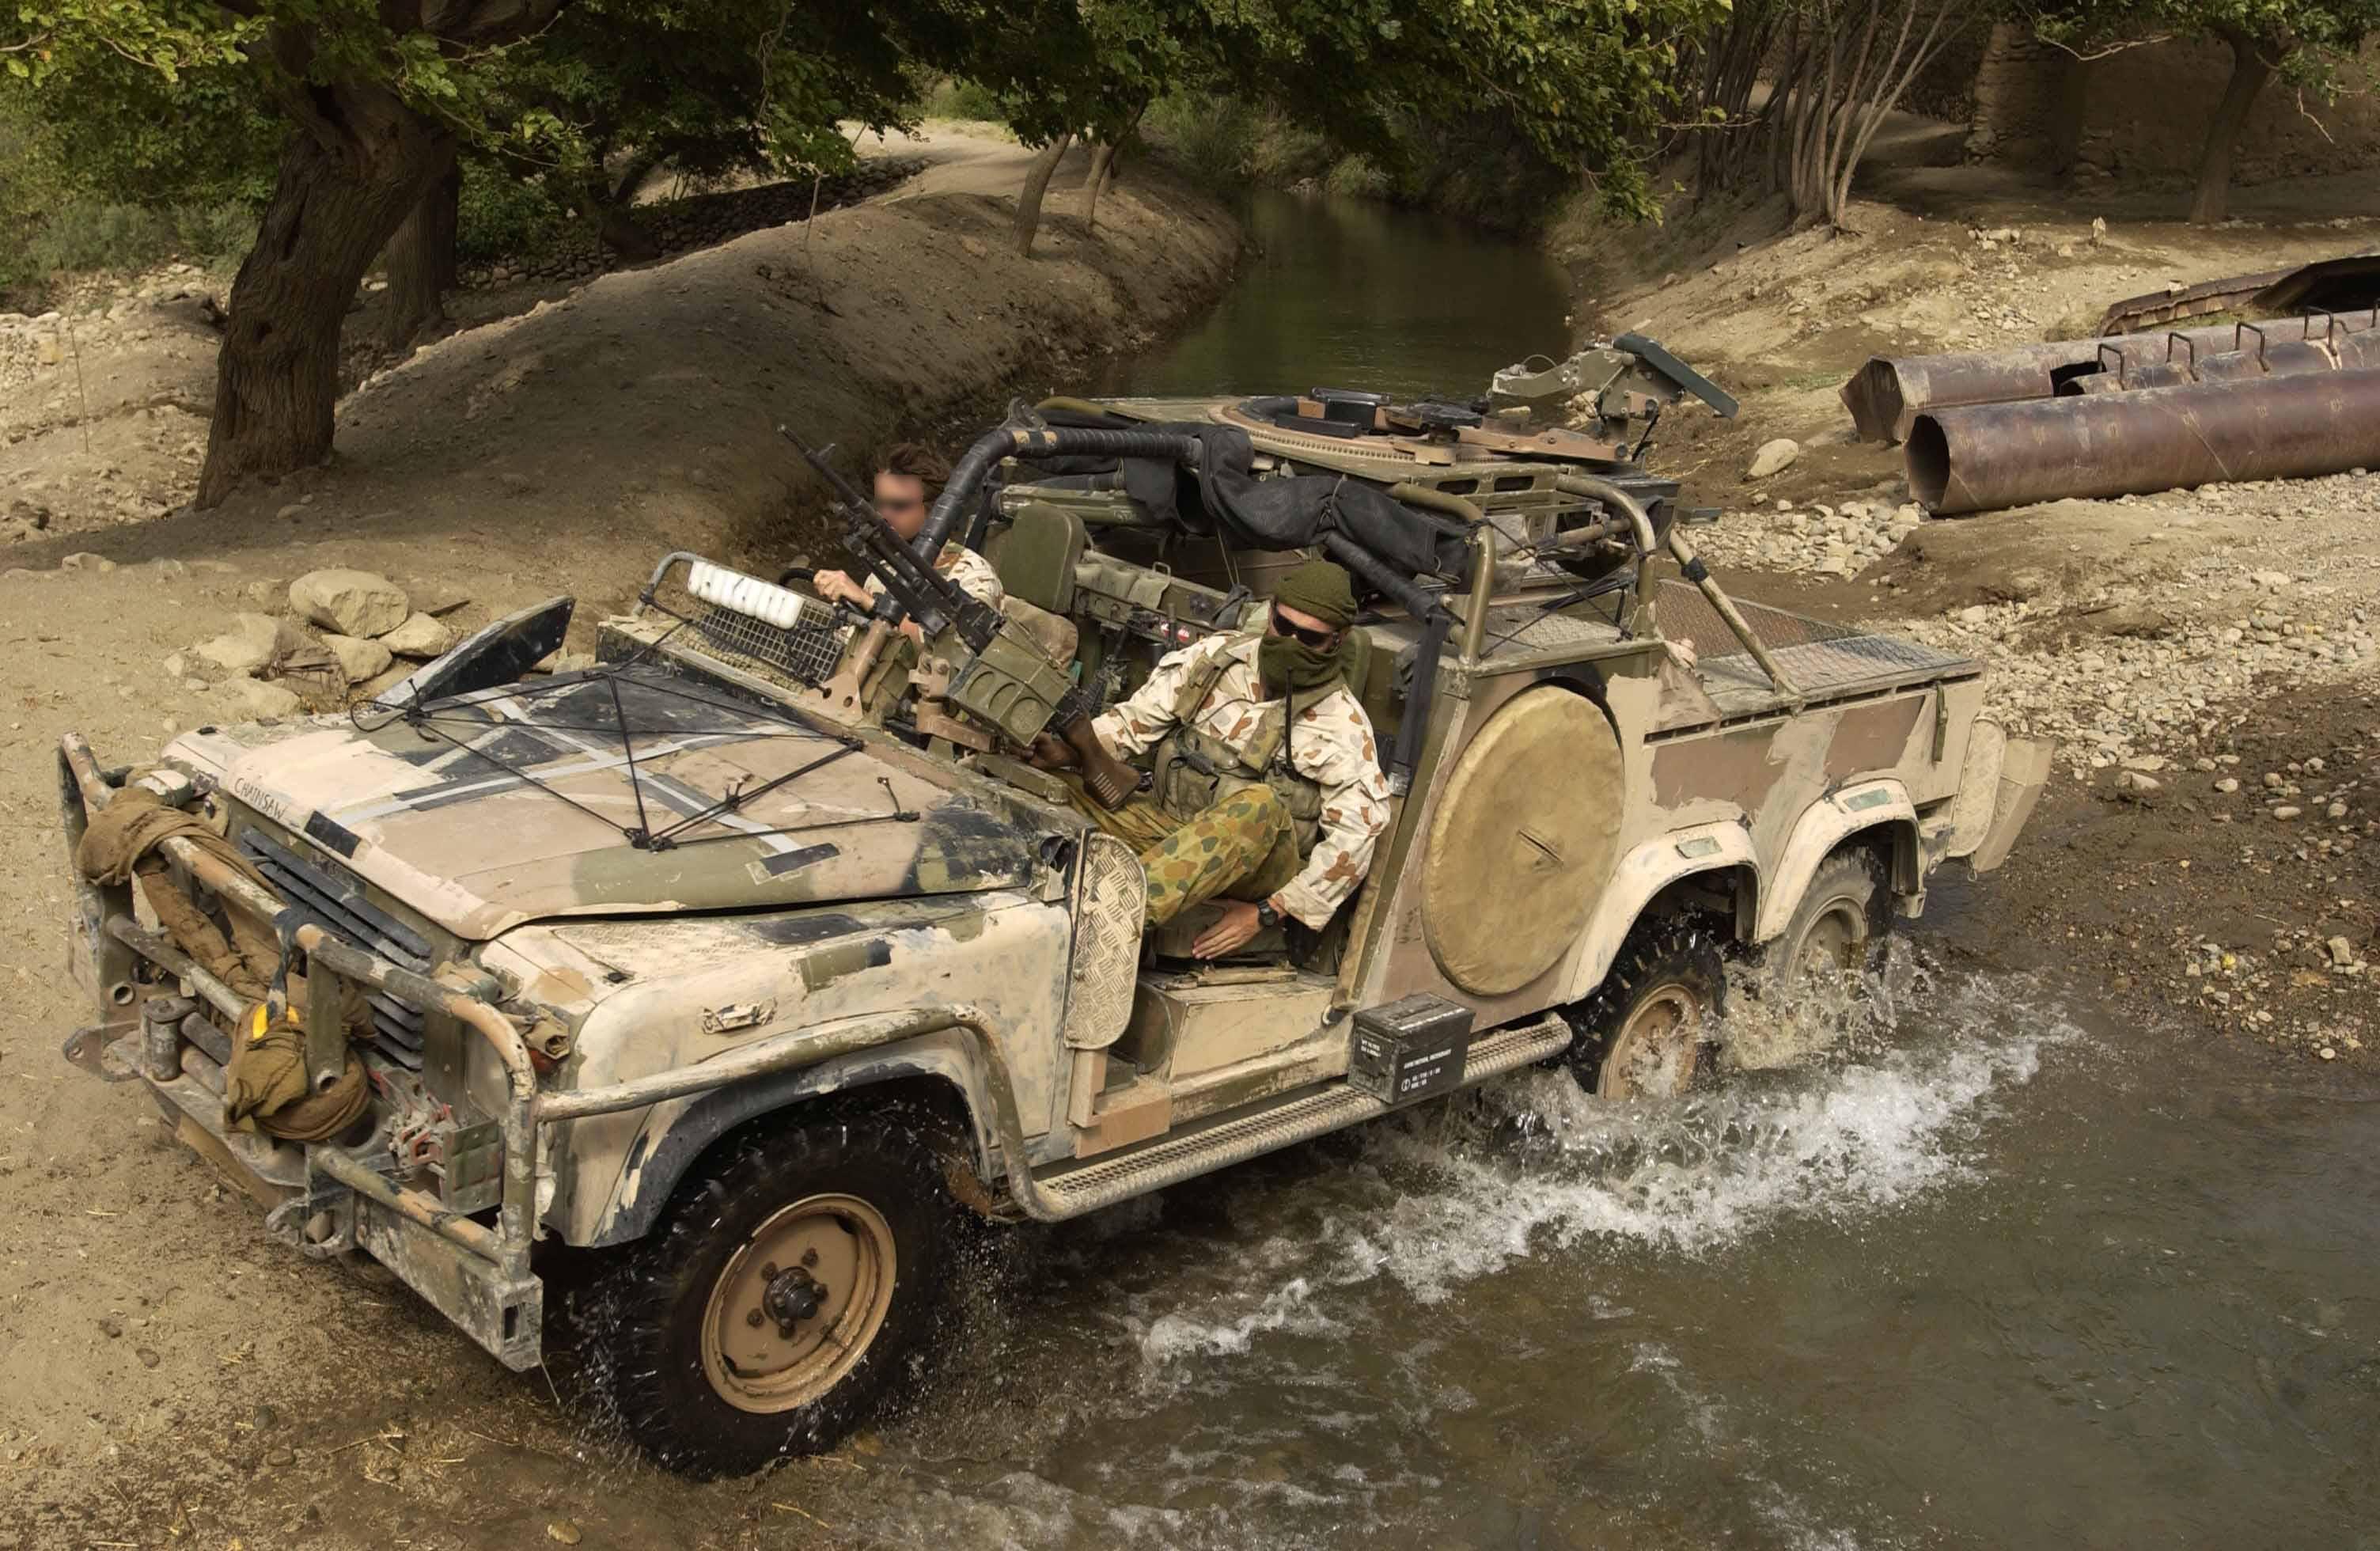 6x6 Land Rover Australian SAS Long Range Patrol Vehicle